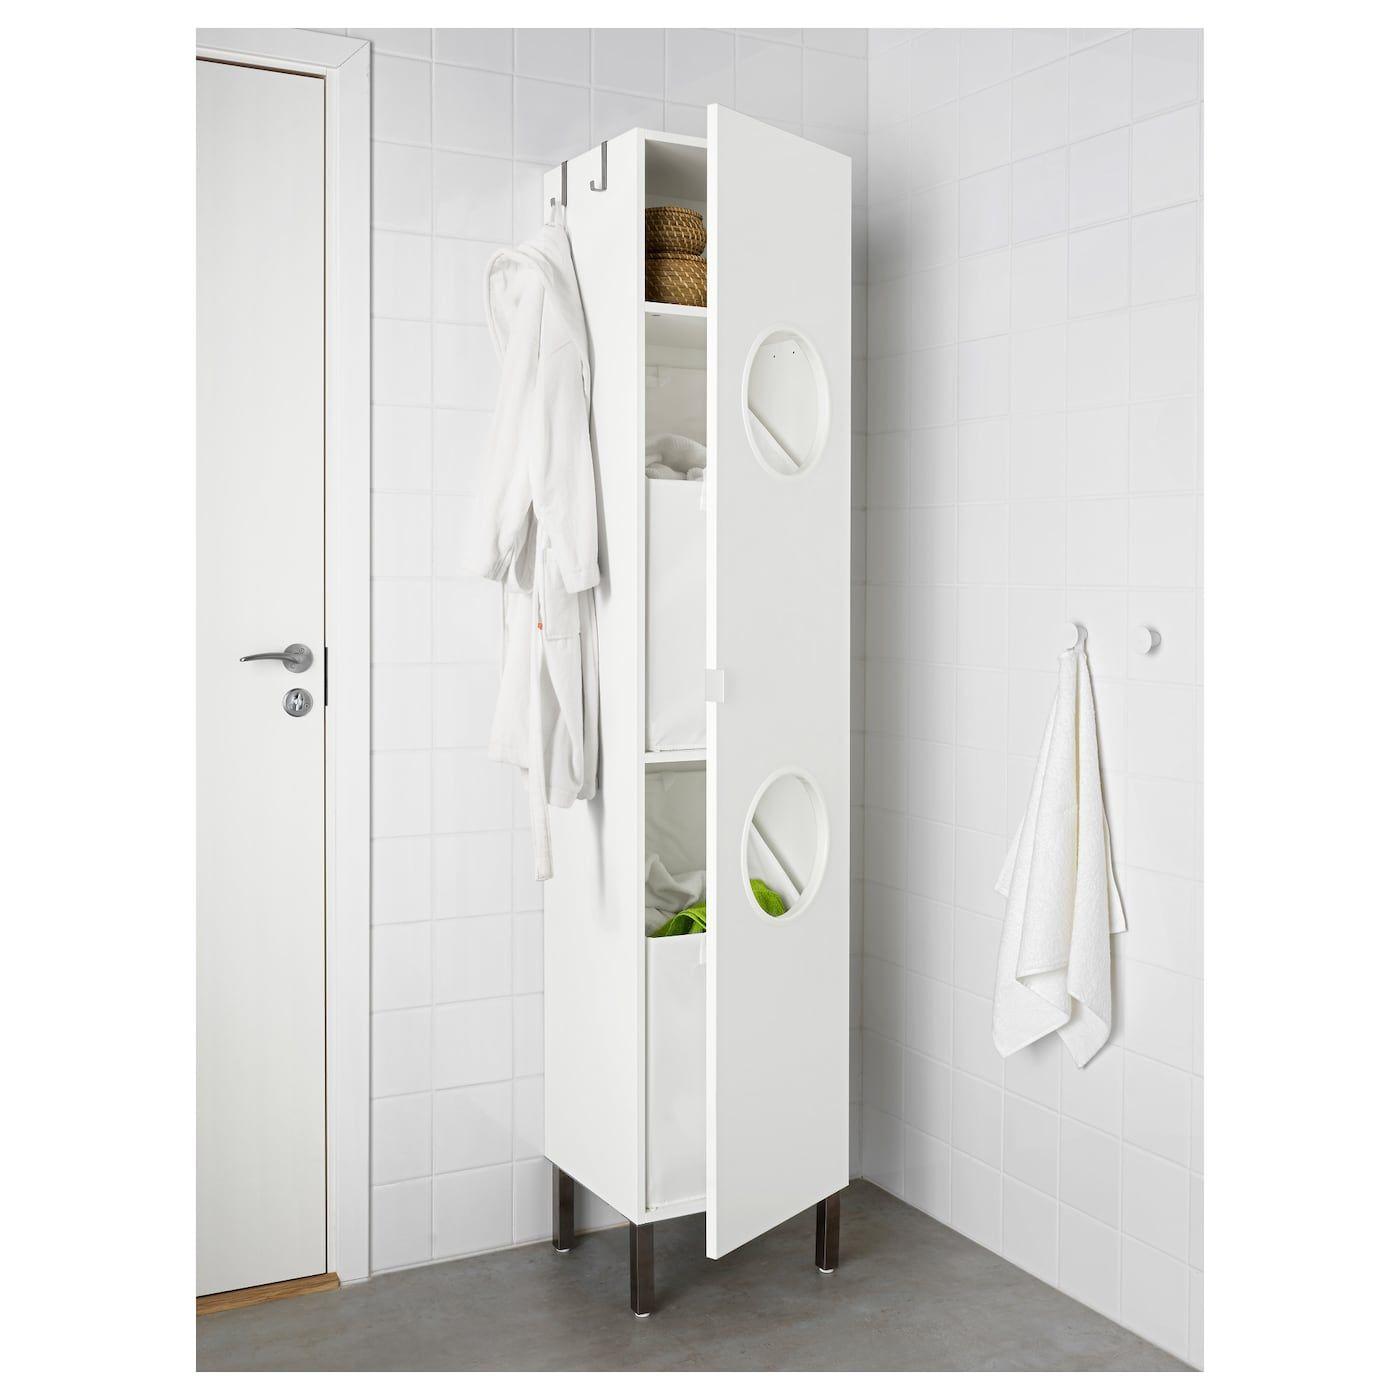 Lillangen Wascheschrank Weiss Ikea Deutschland Wascheschrank Ikea Wascheschrank Und Wascheschrank Weiss